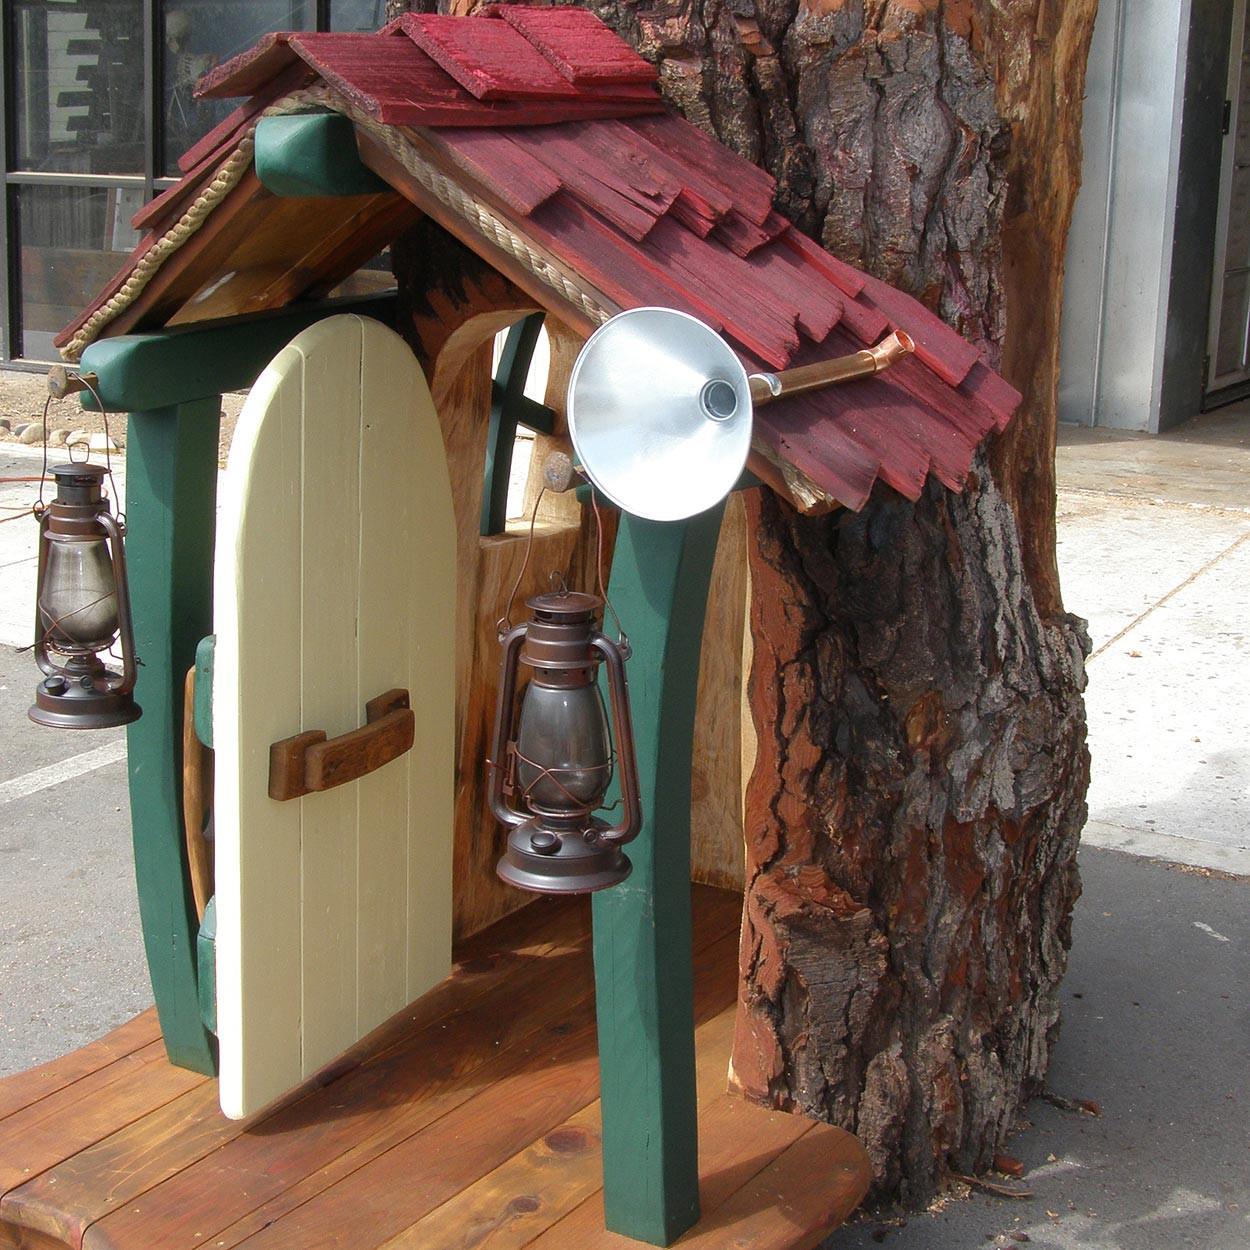 Original Outdoor Playhouse - Mini Porch